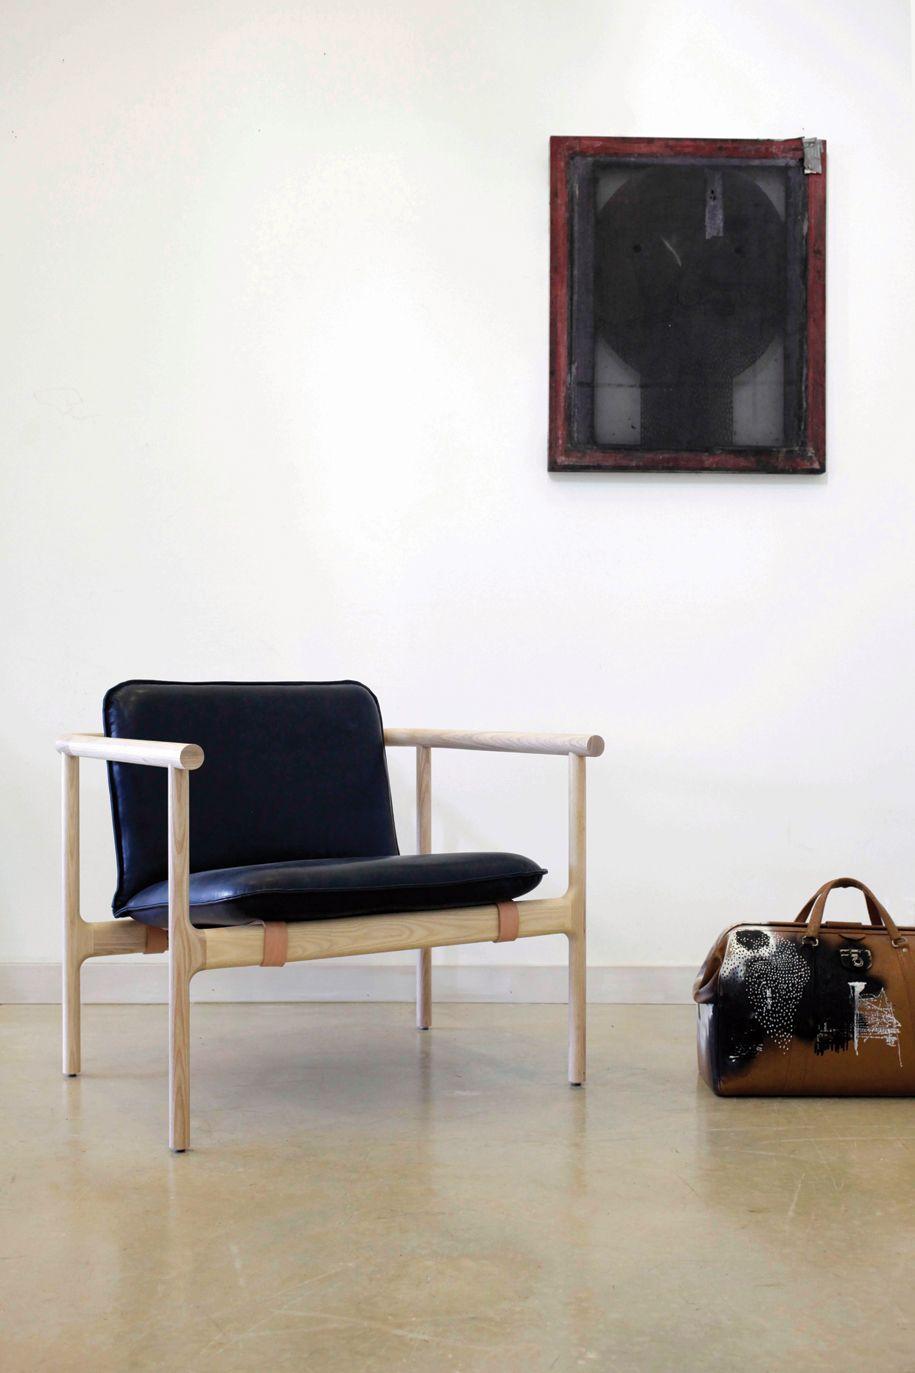 japanese minimalist furniture. The Japanese Minimalism Of Hoshi Minimalist Furniture R